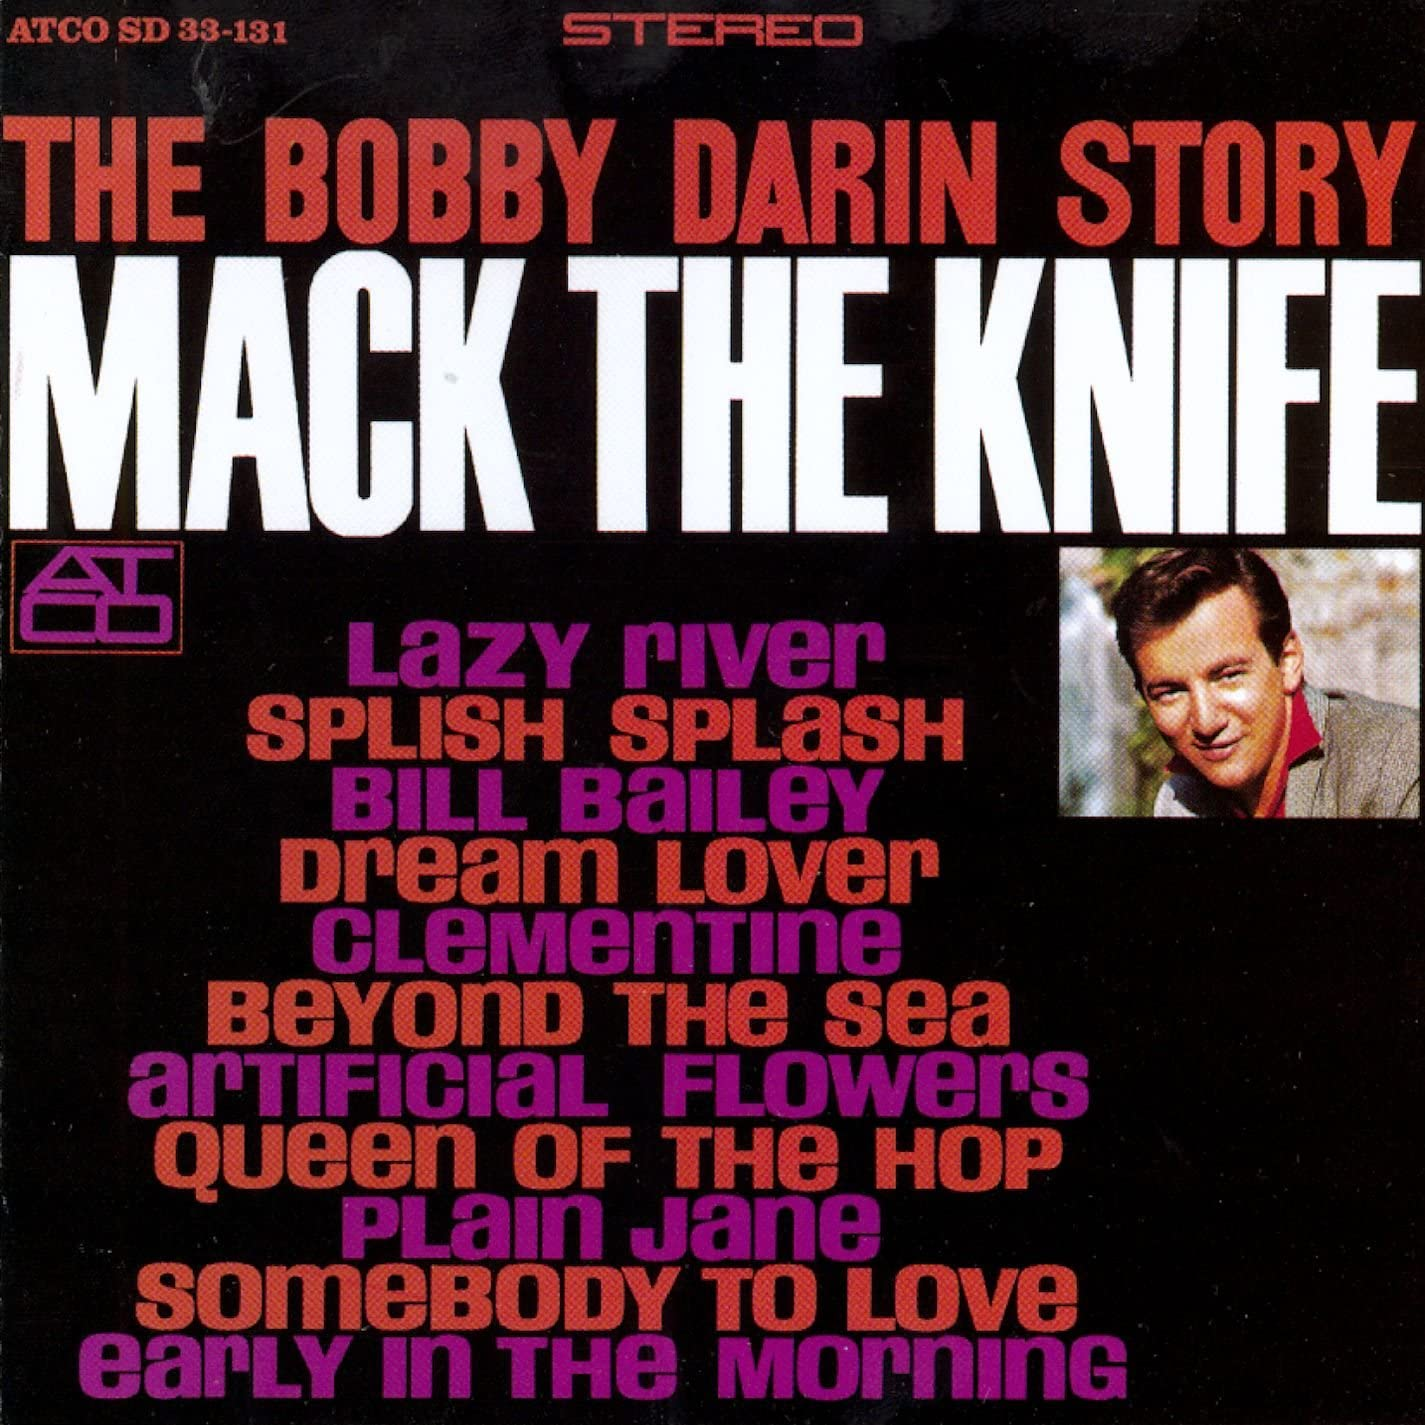 Bobby Darin Story   Darin, Bobby   ポップス   音楽 - Amazon